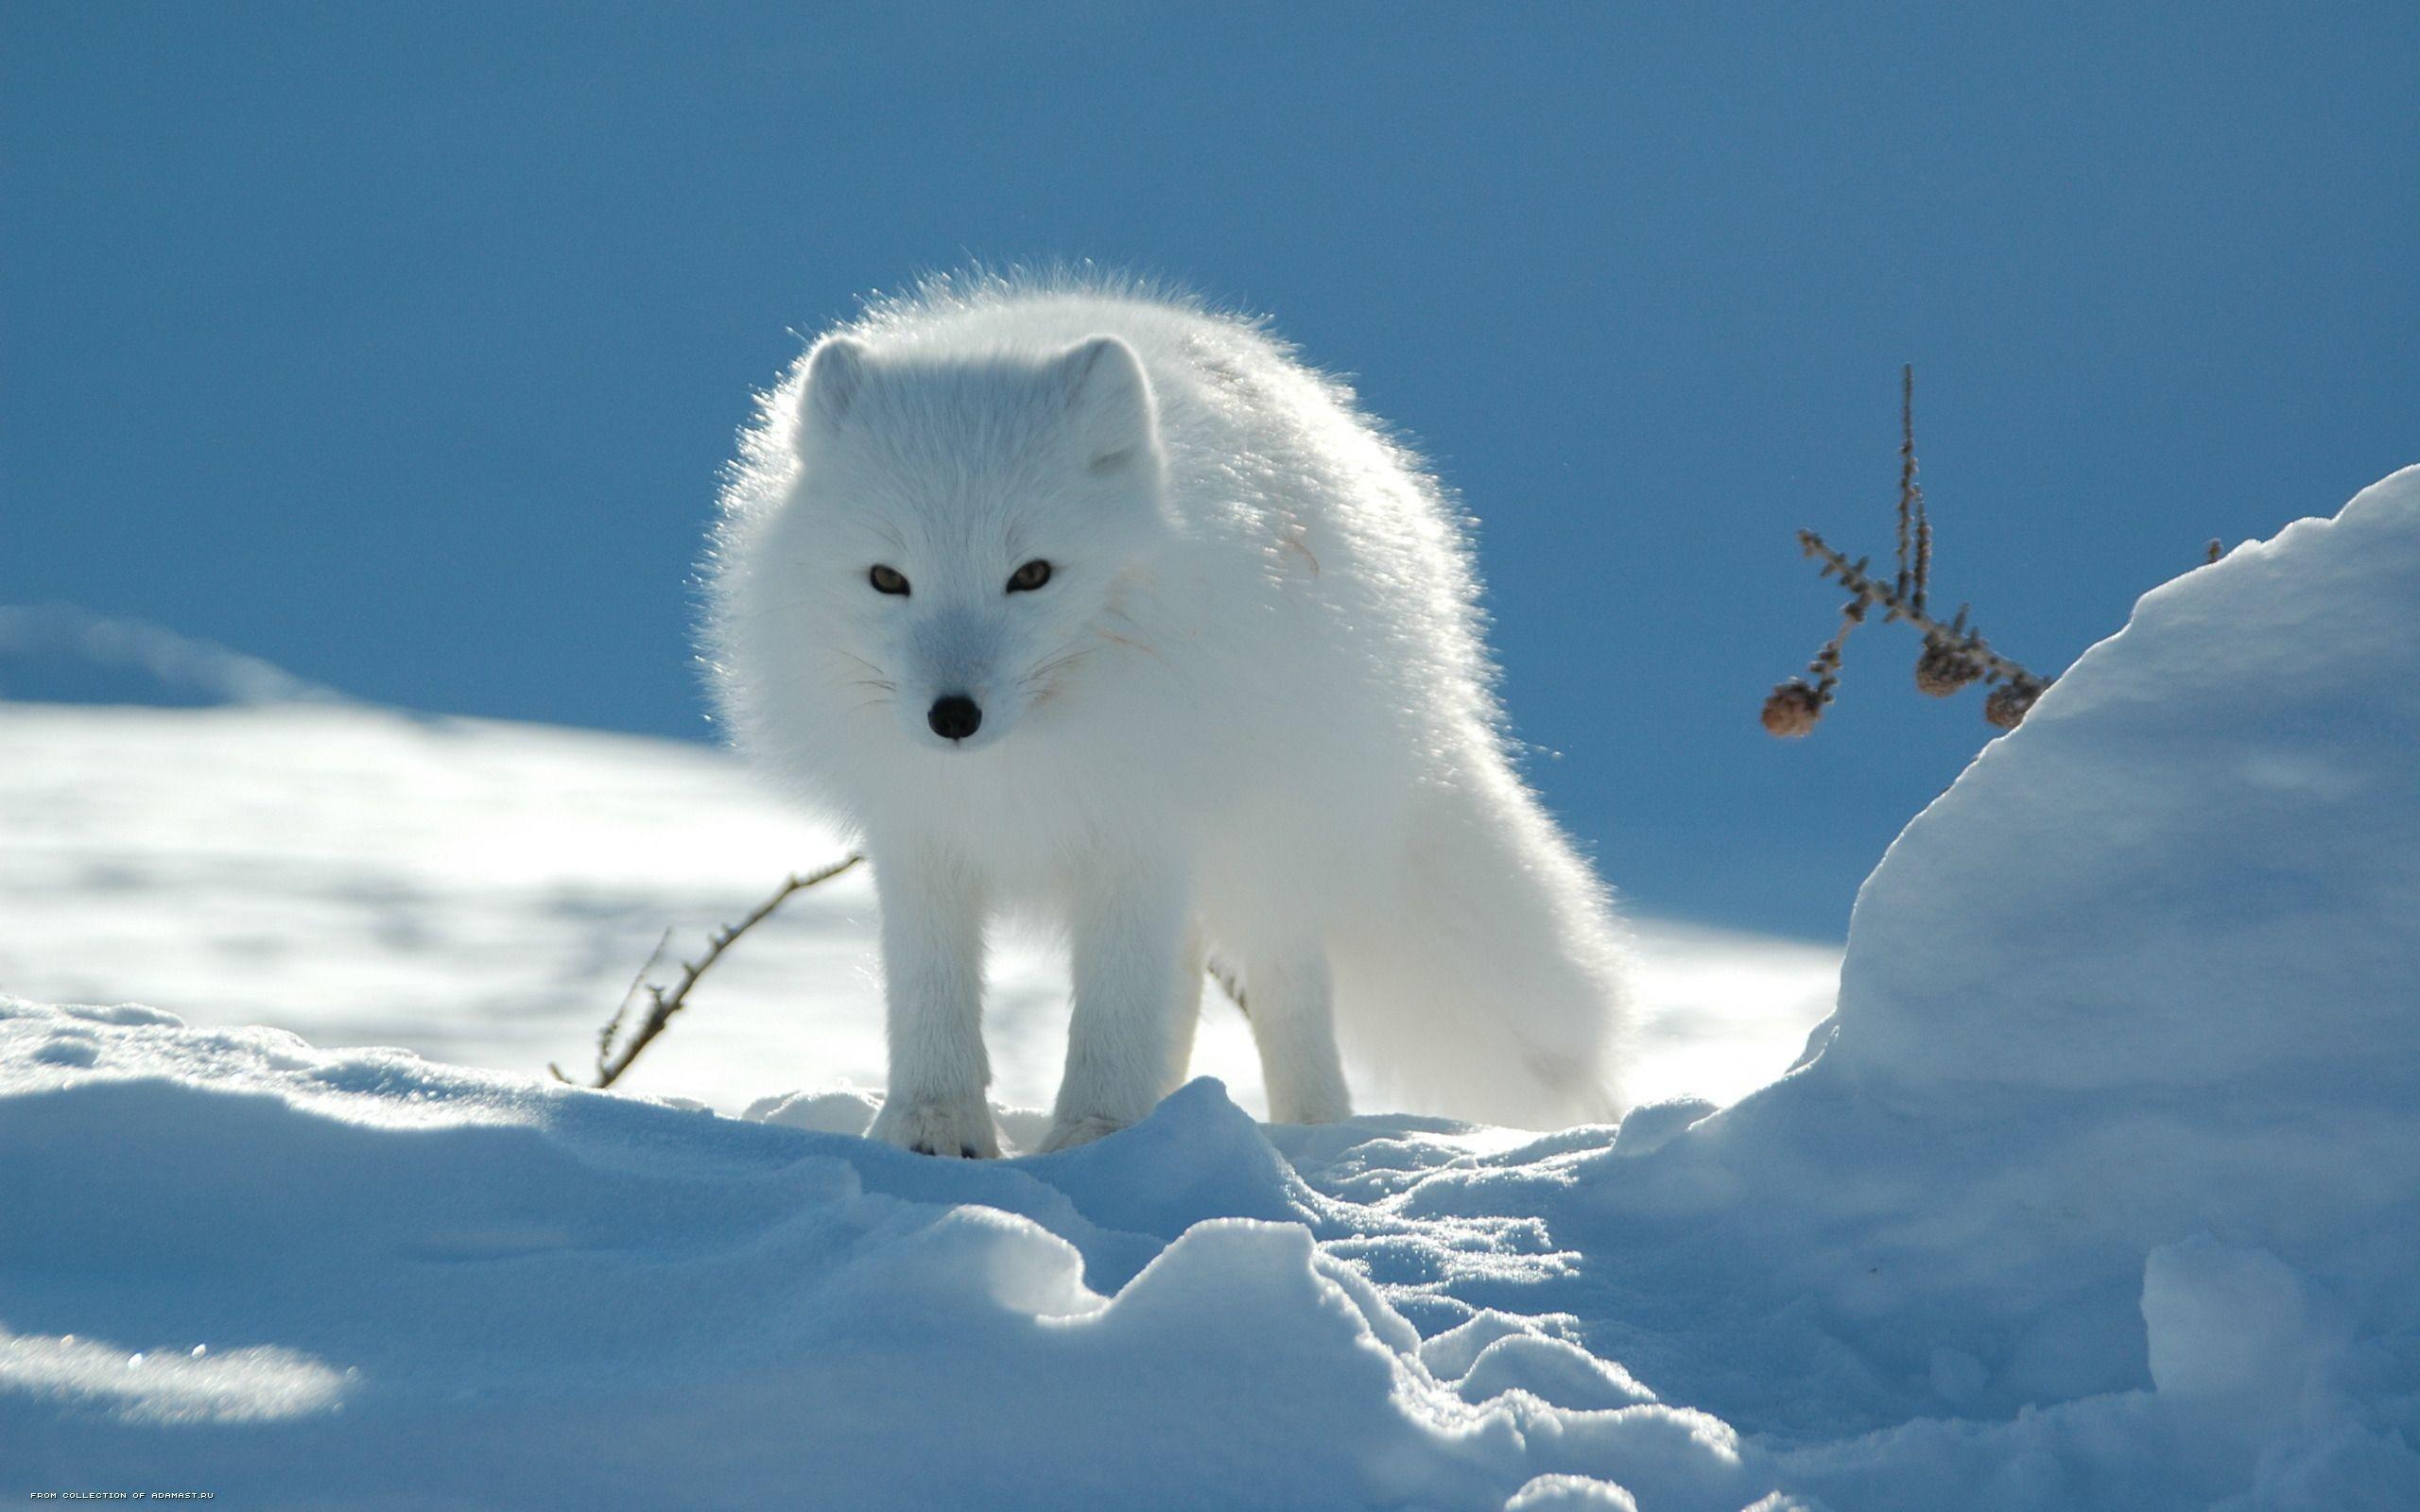 Free Winter Animal Desktop Wallpaper | wallpaper, wallpaper hd .